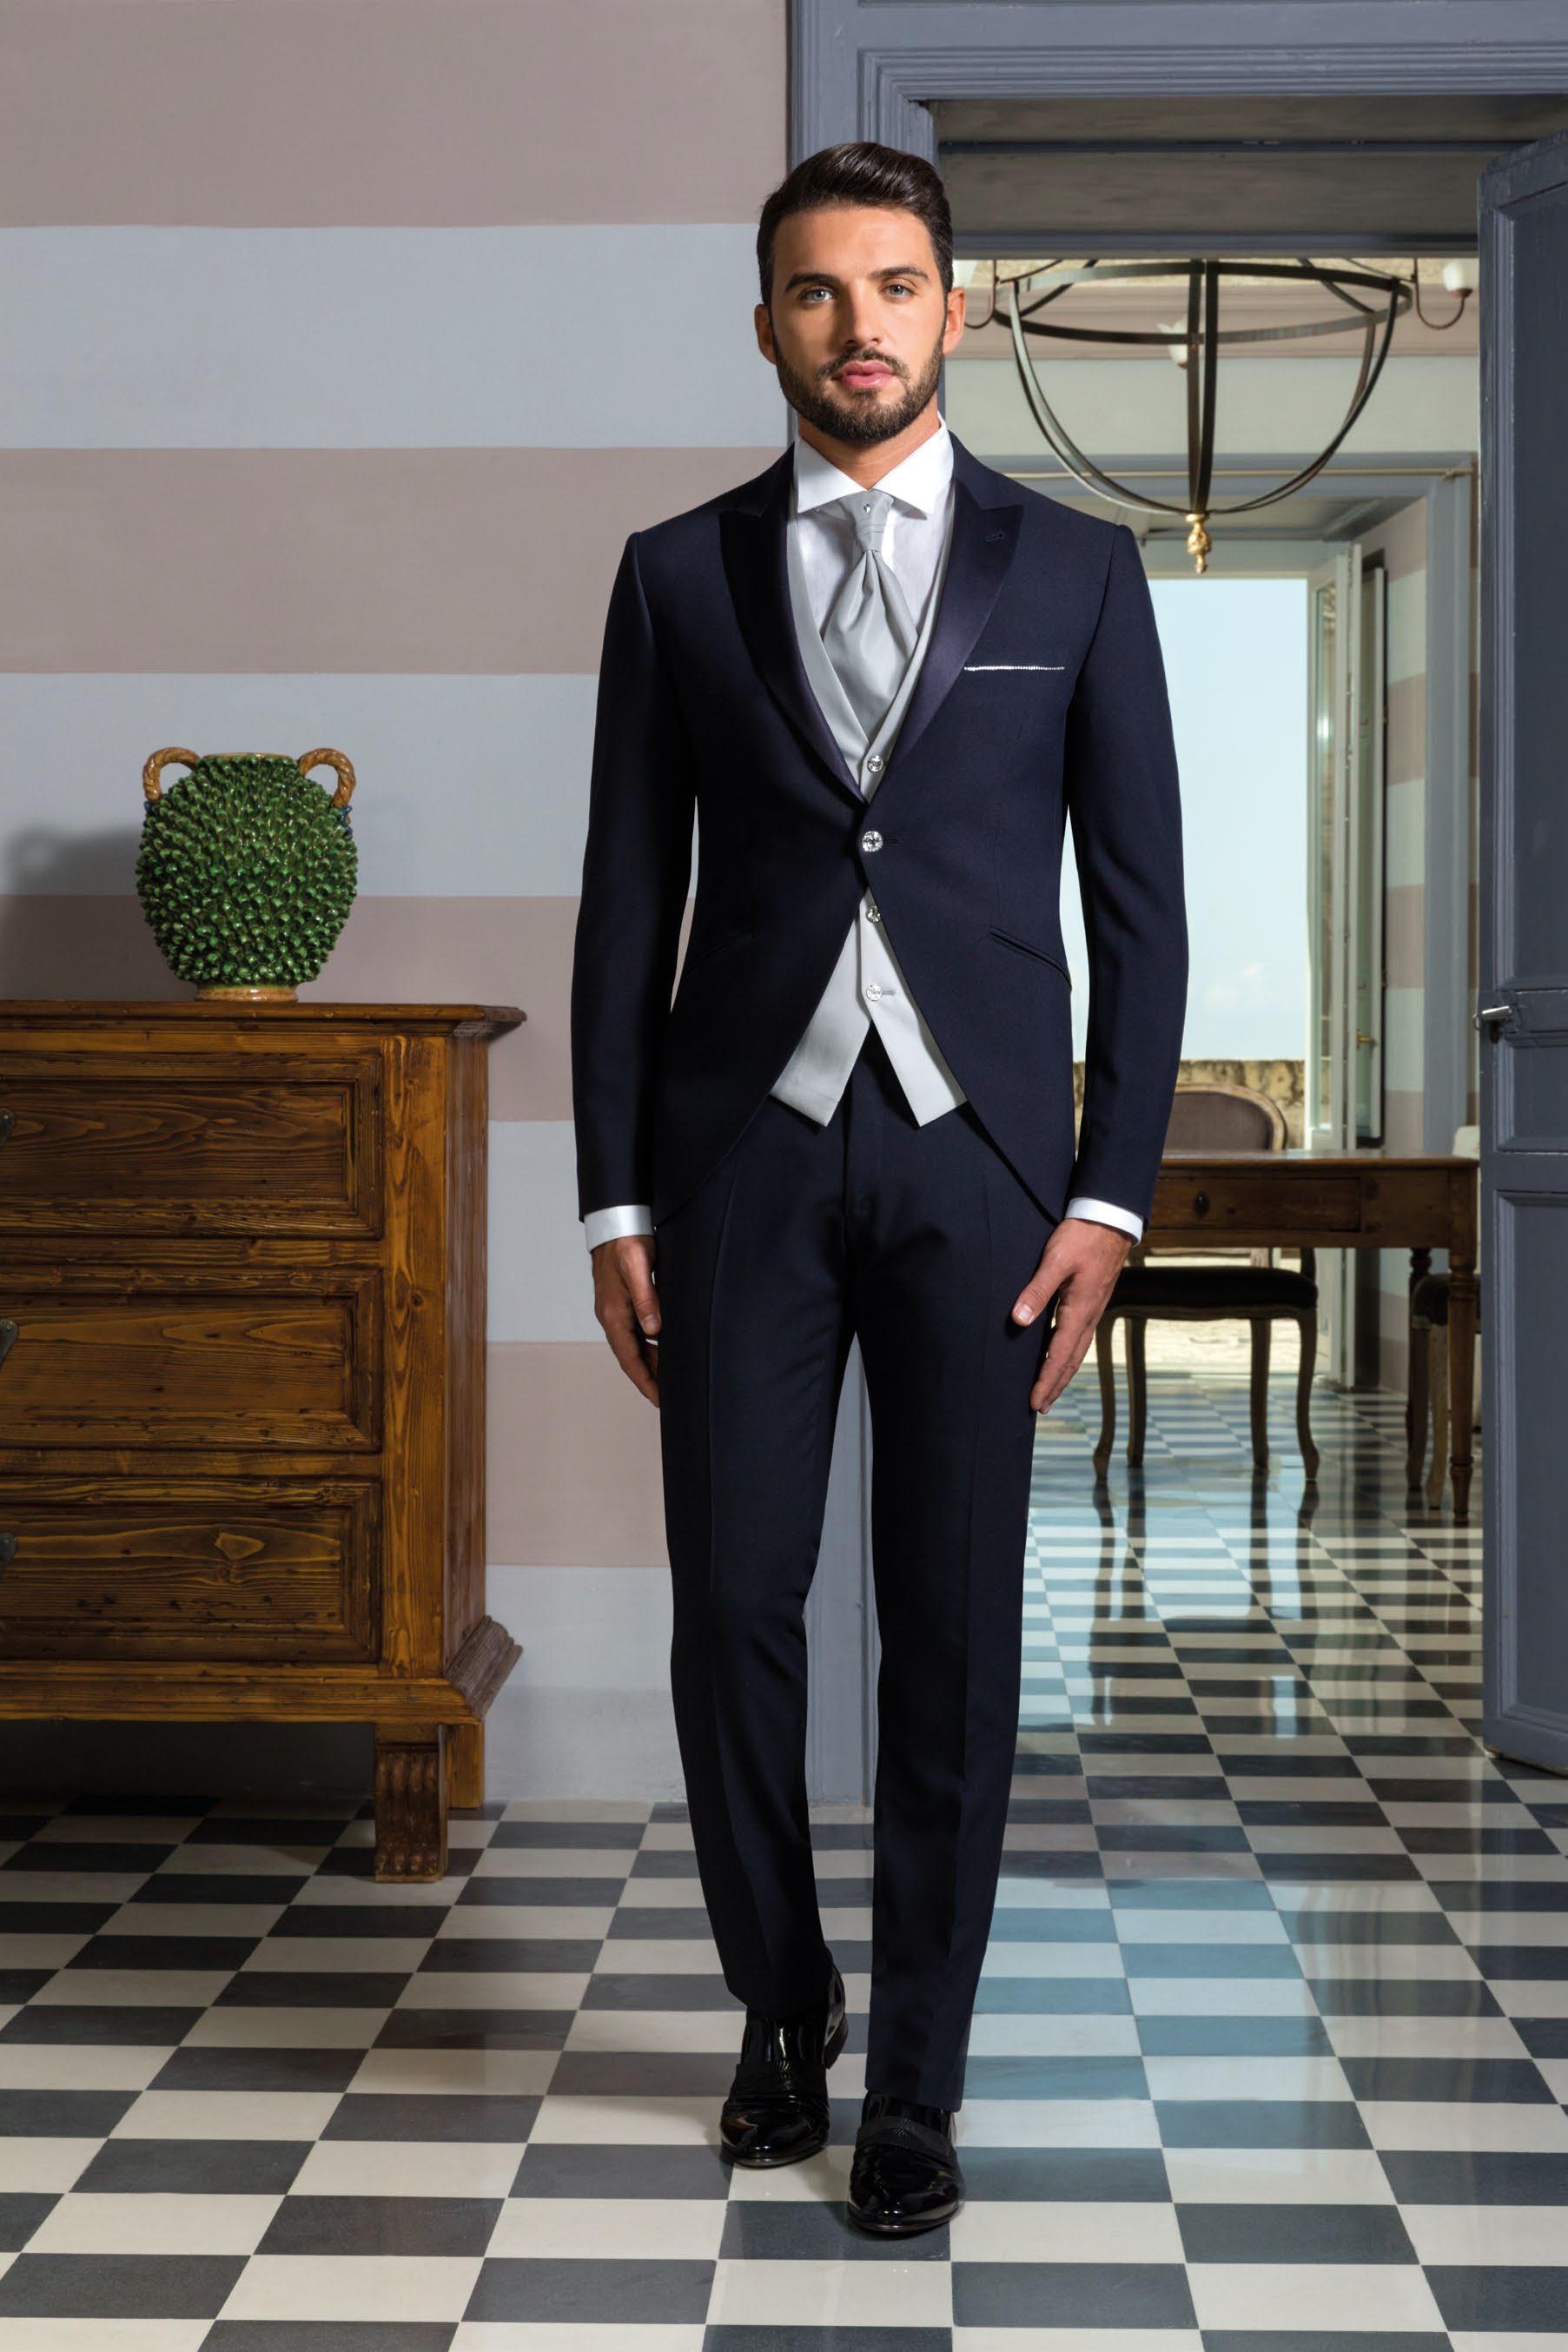 Abiti Matrimonio Uomo Genova : Abito da cerimonia uomo genova i vestiti sono popolari